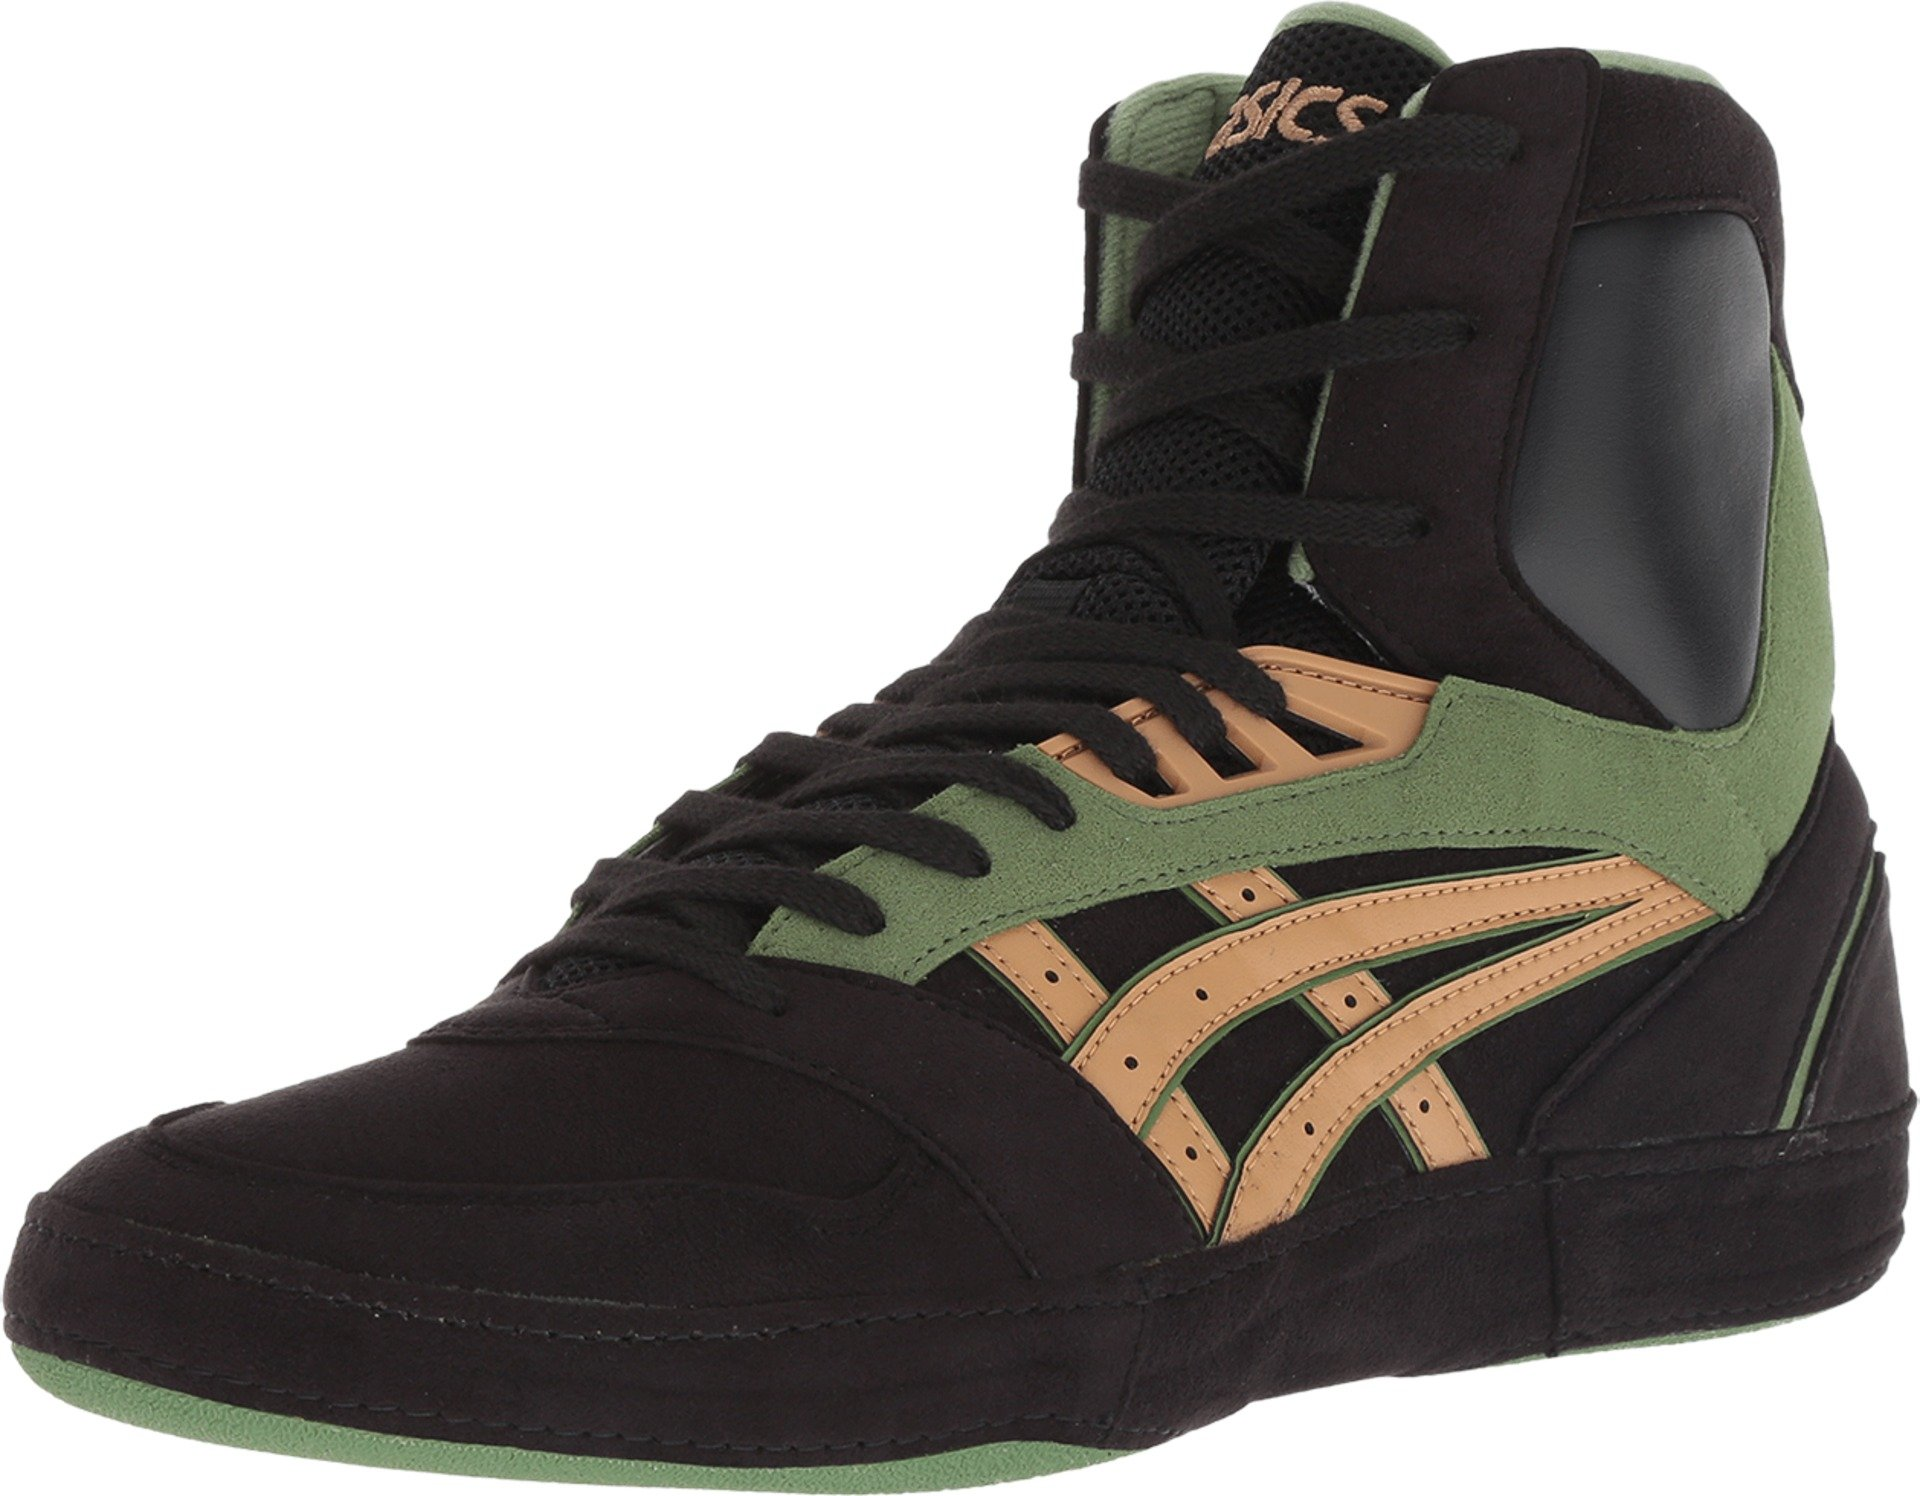 ASICS International Lyte Men's Wrestling Shoes, Black/Caravan, Size 11 by ASICS